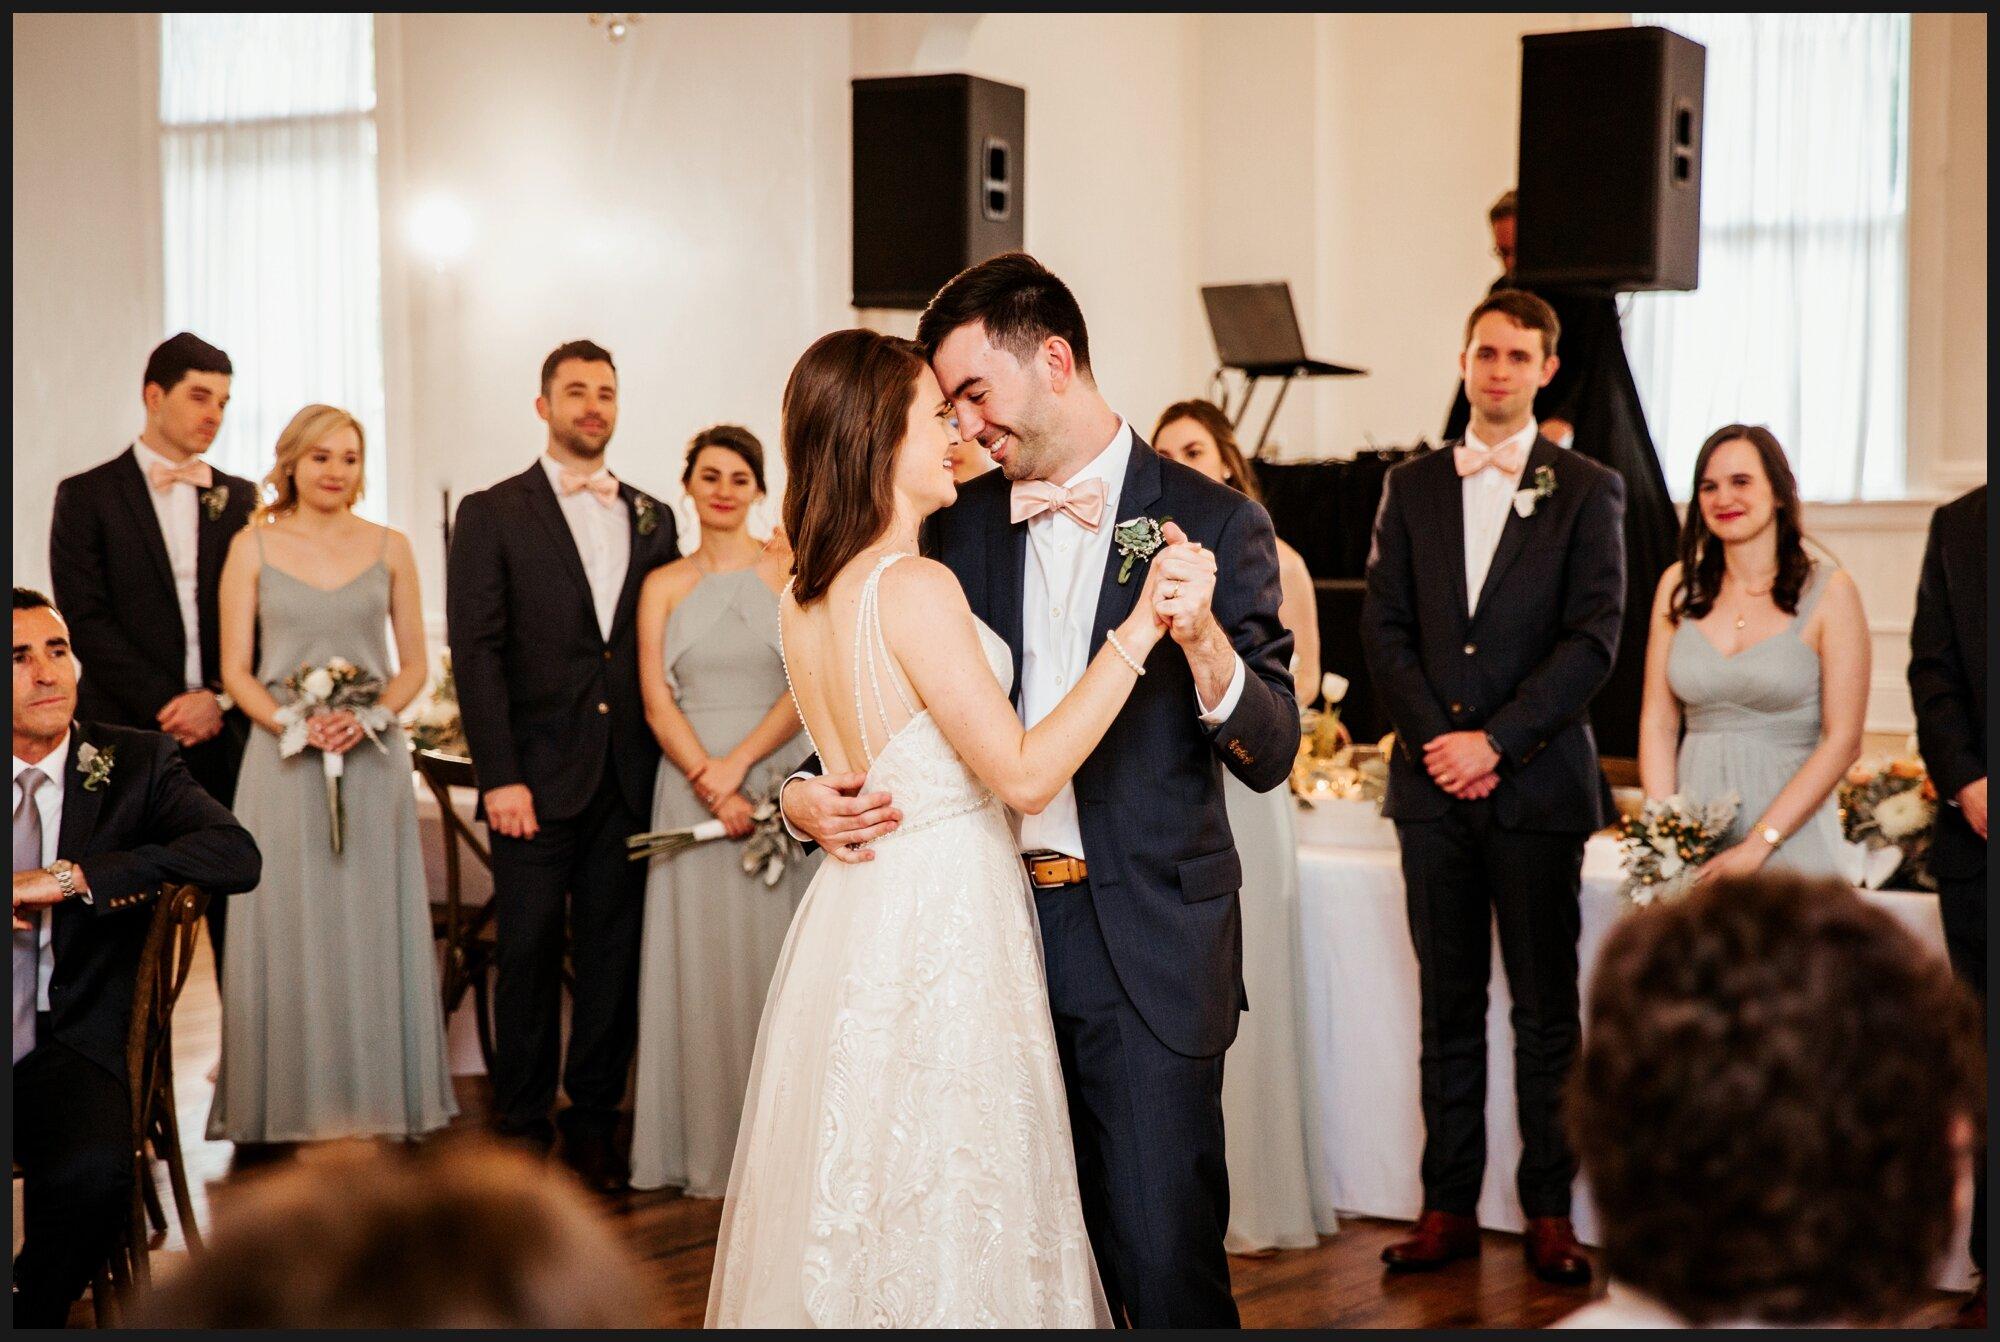 Orlando-Wedding-Photographer-destination-wedding-photographer-florida-wedding-photographer-hawaii-wedding-photographer_0690.jpg